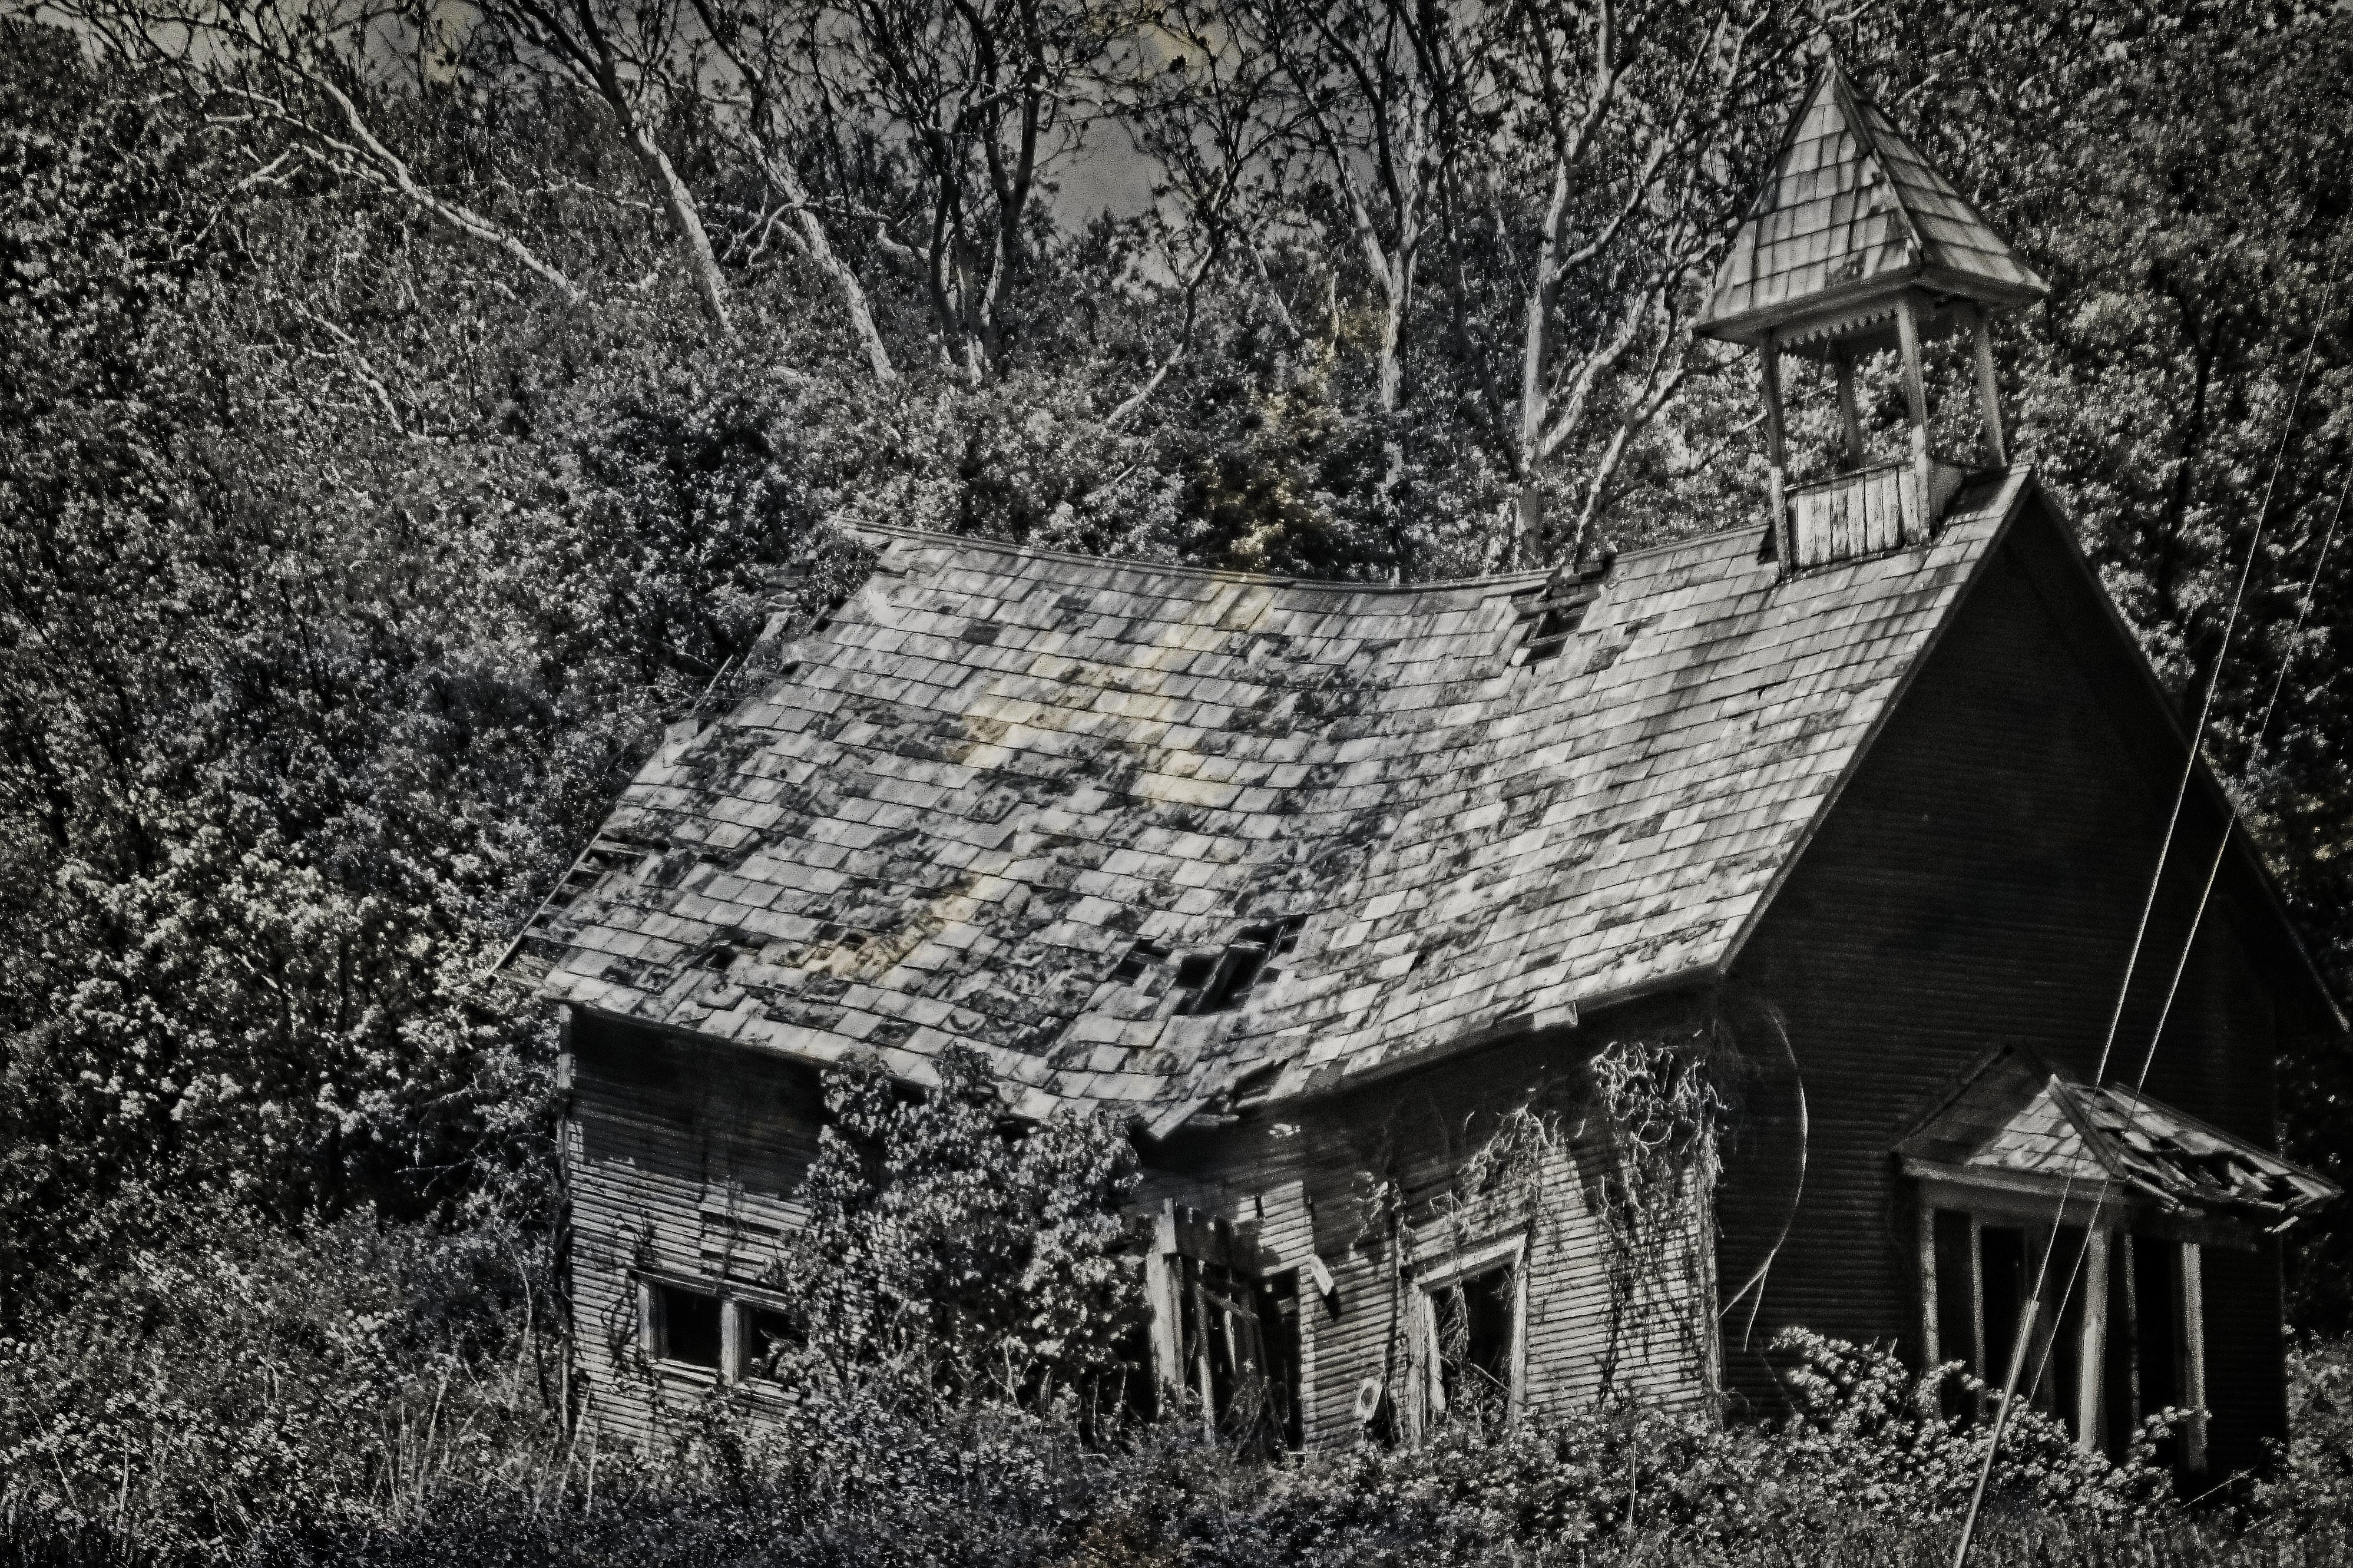 Abandoned schoolhouse (monotone)